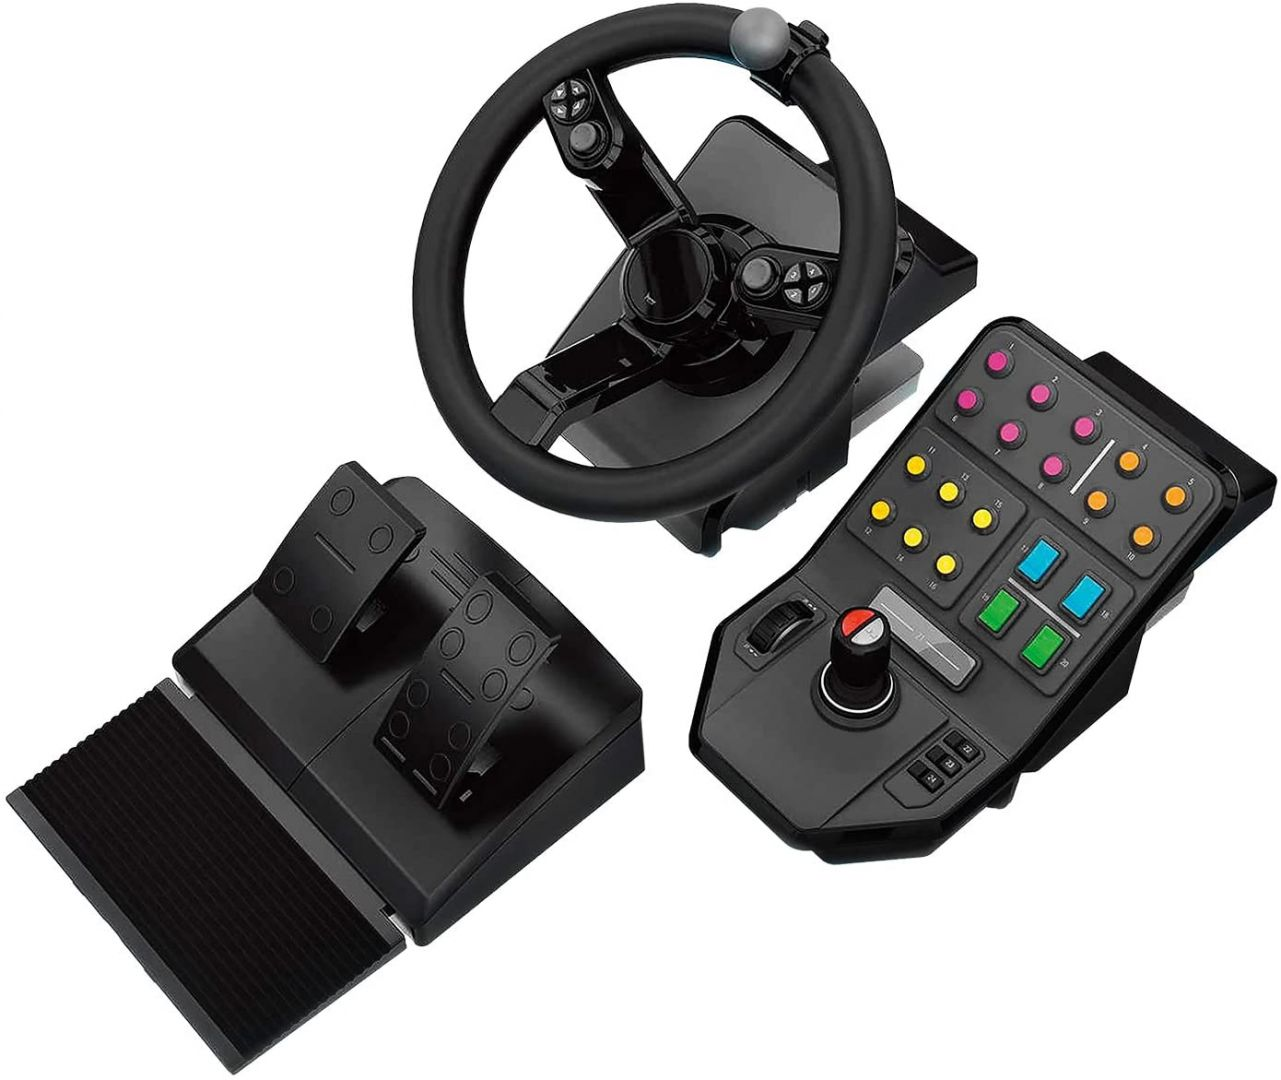 Logitech G Saitek Farming Simulator Controller (945-000007)